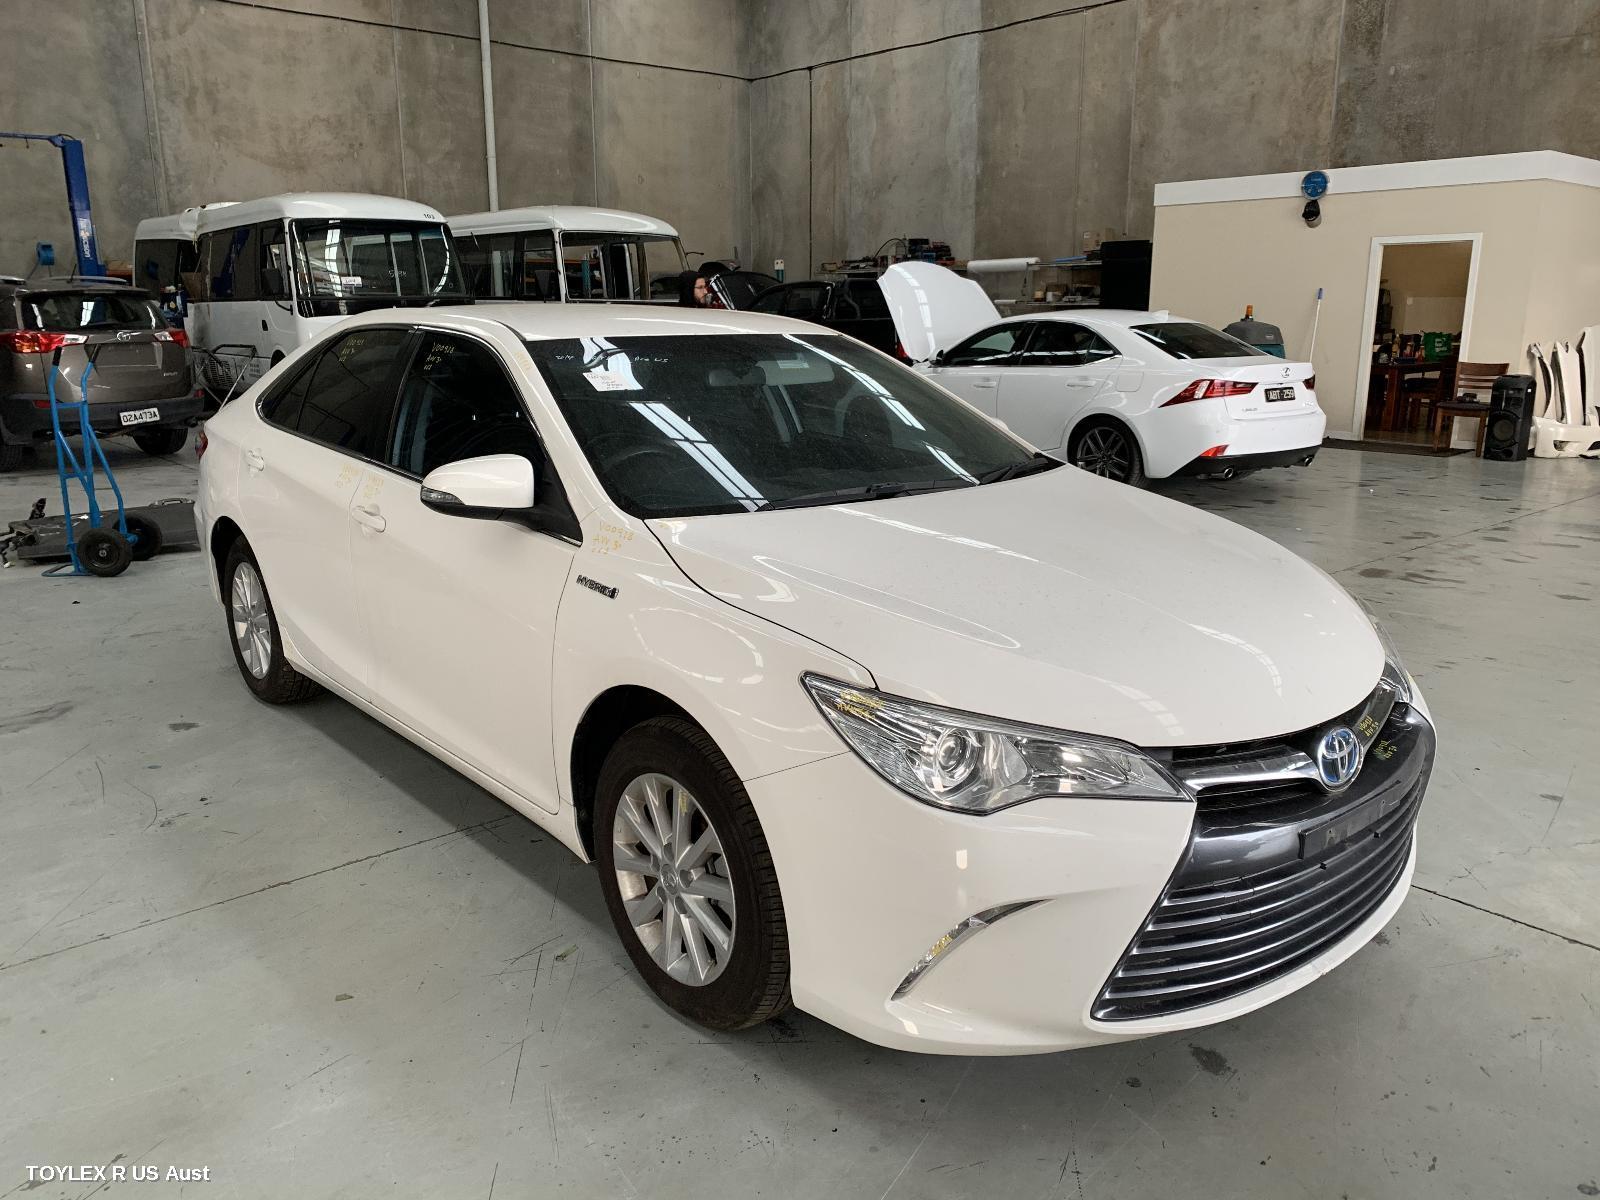 Toyota Camry Altise Hybrid AVV50 R 2AR-FXE 2.5L Engine Automatic FWD Transmission 05/15 - 10/17